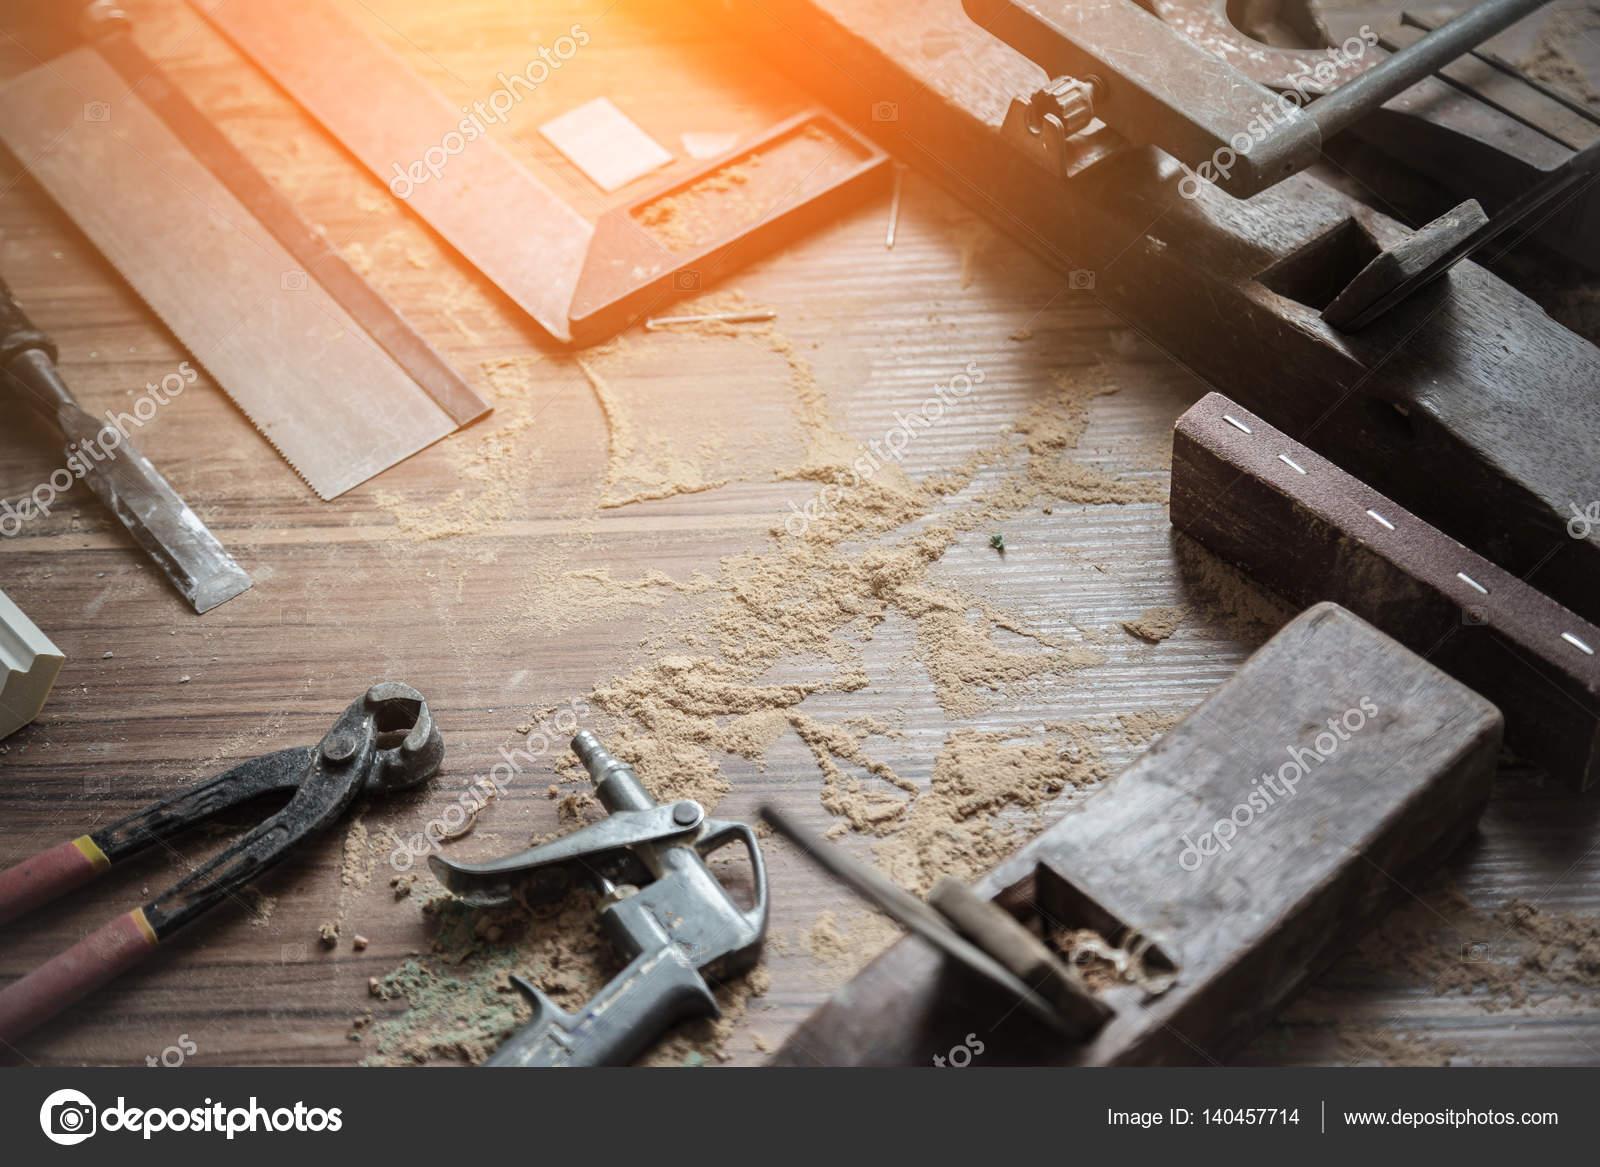 Wood Workshop Handcraft Tools Raw Wood Construction Site Stock